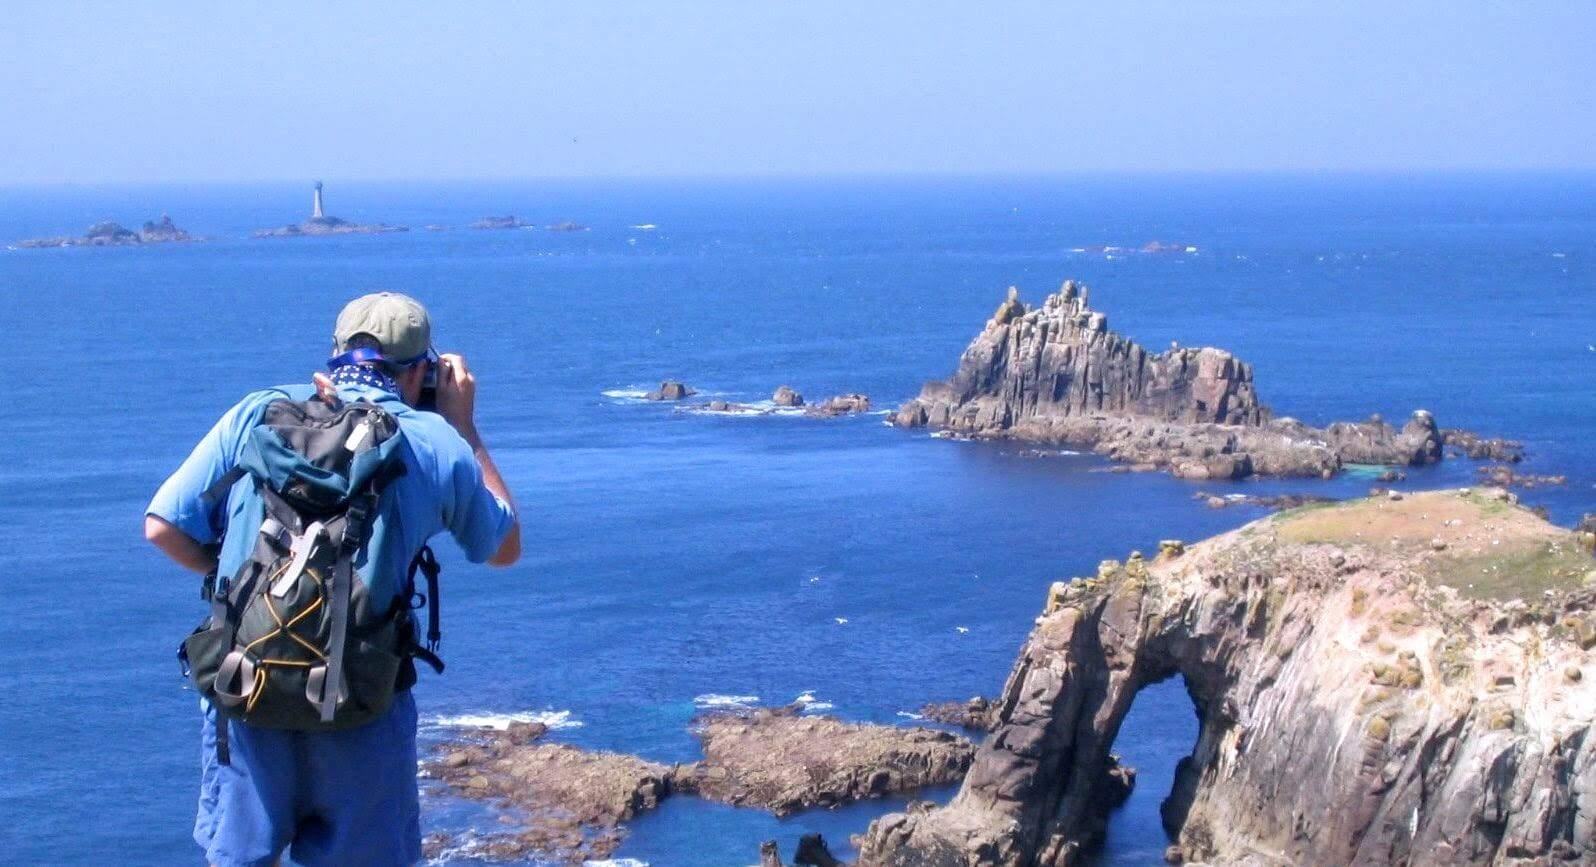 Image of walking with binoculars at lands end